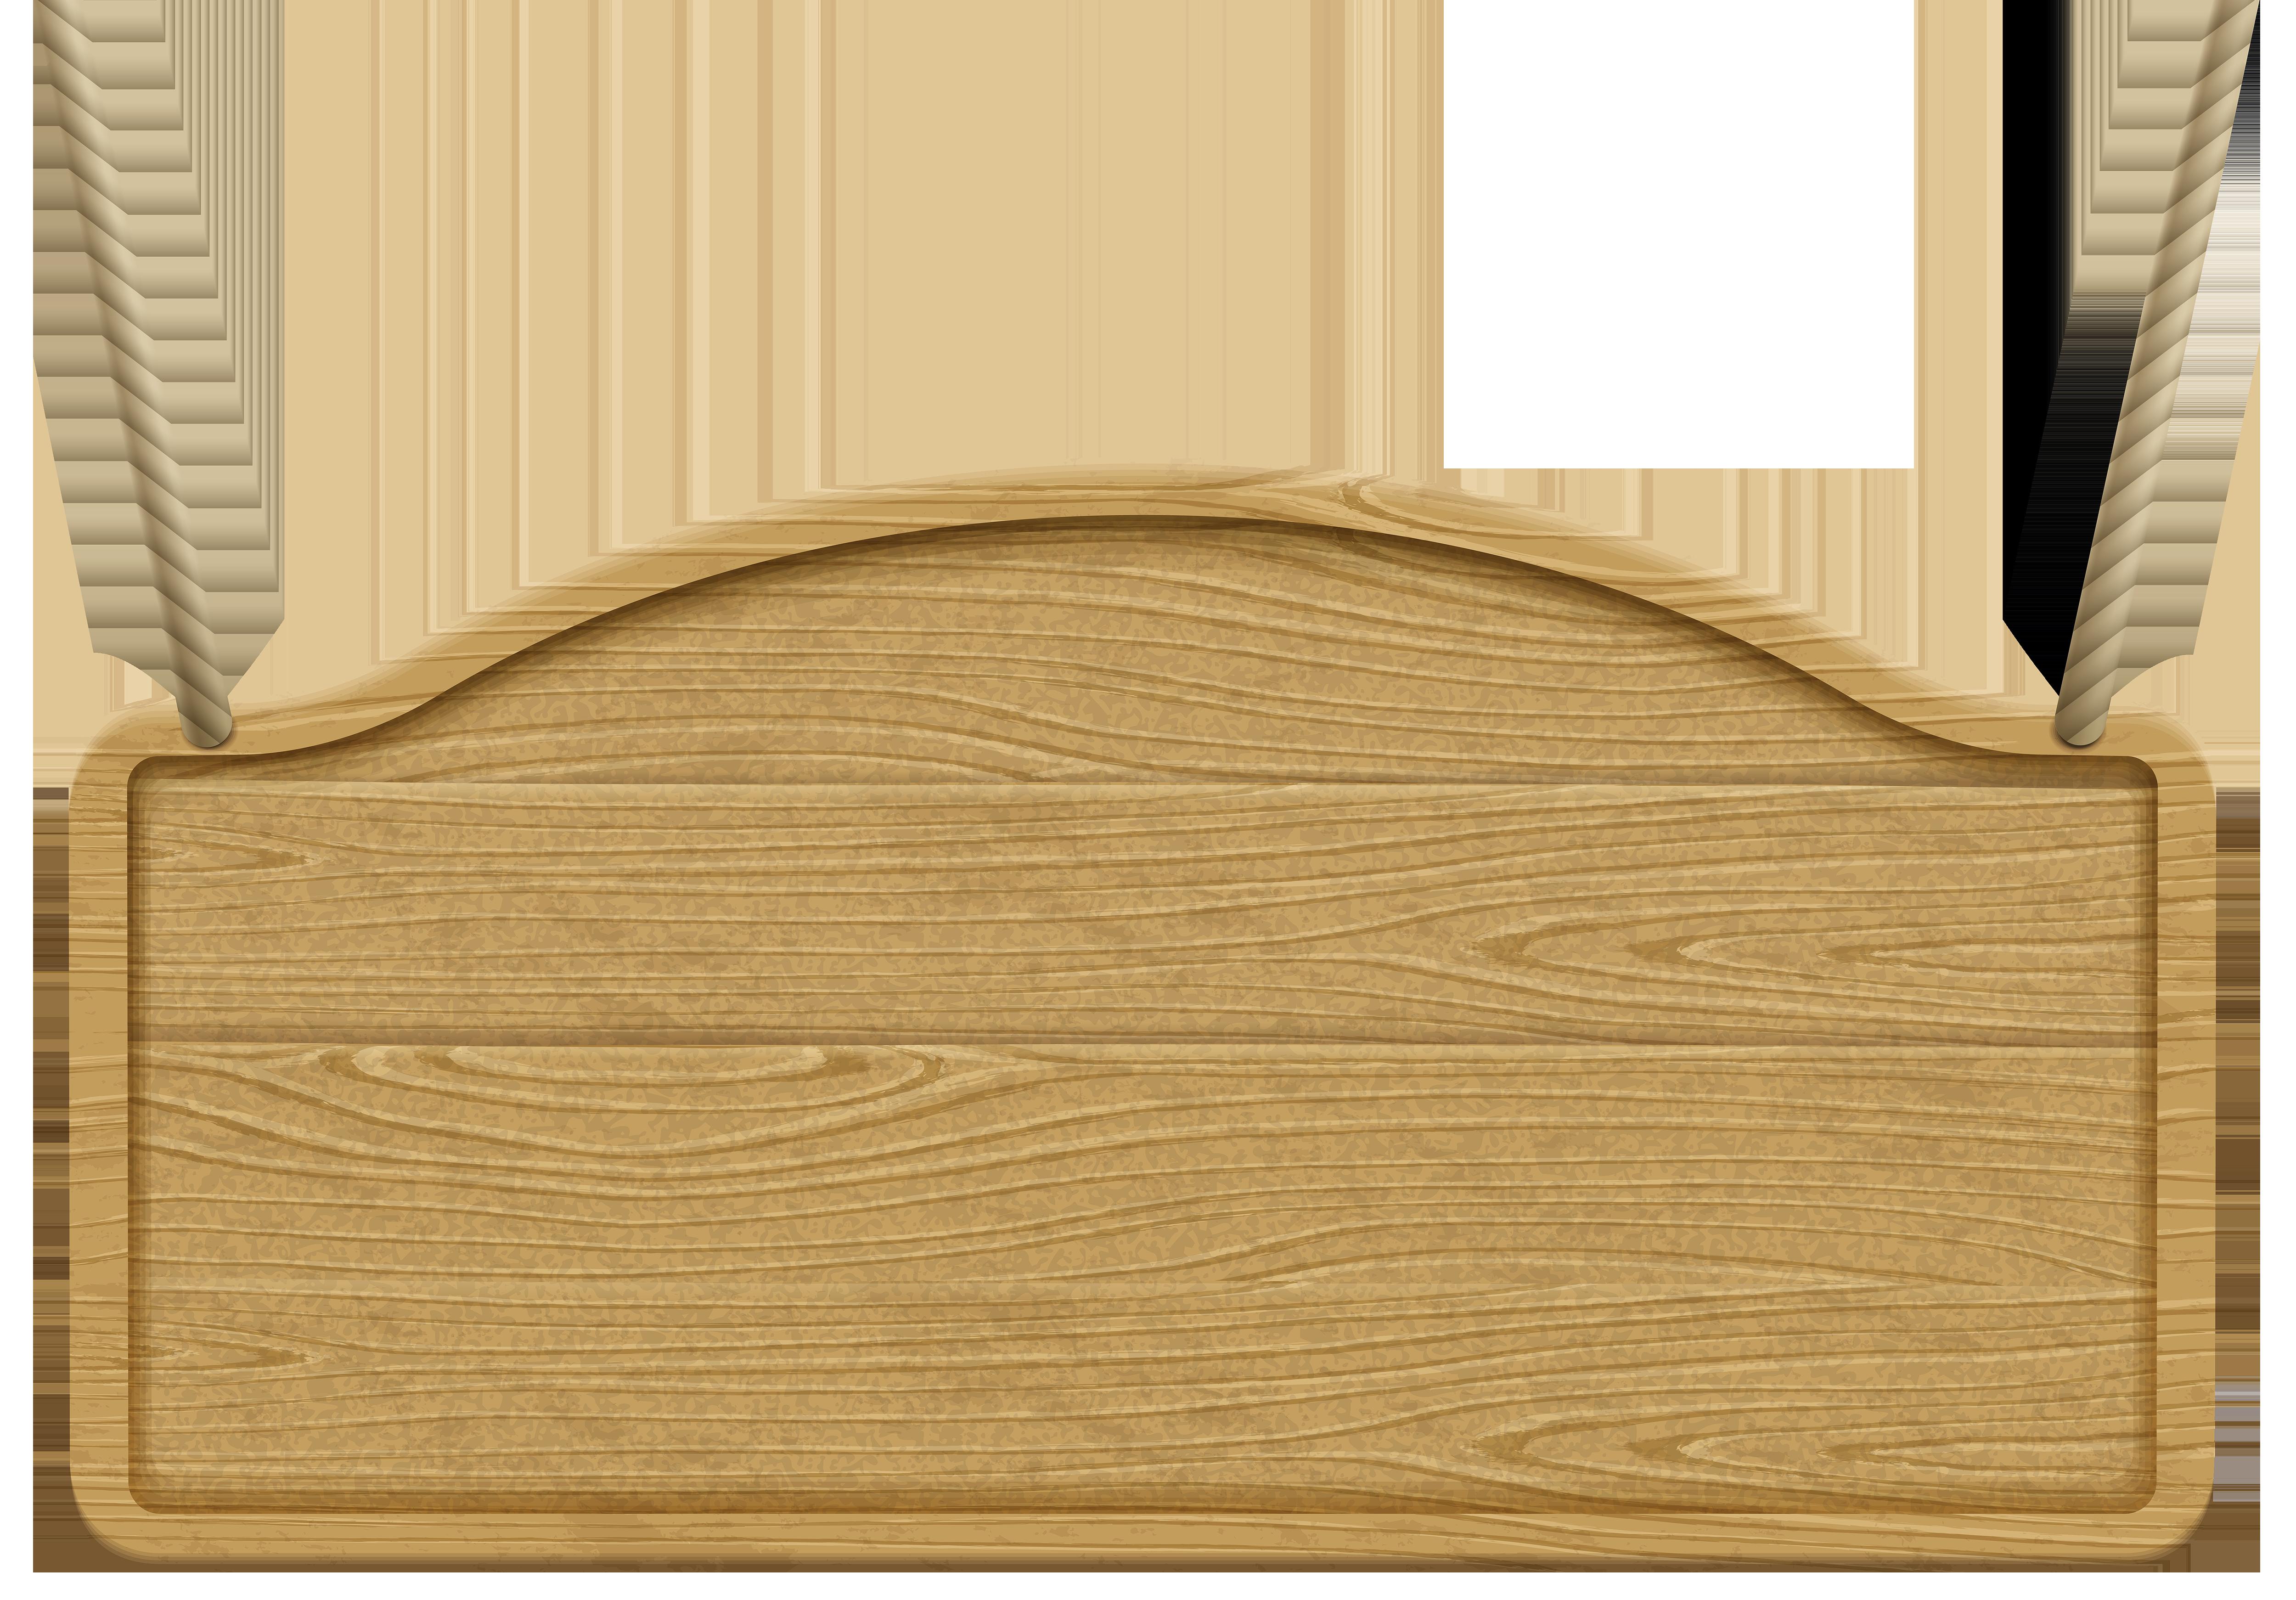 Wooden Signboard Transparent Clip Art Image.